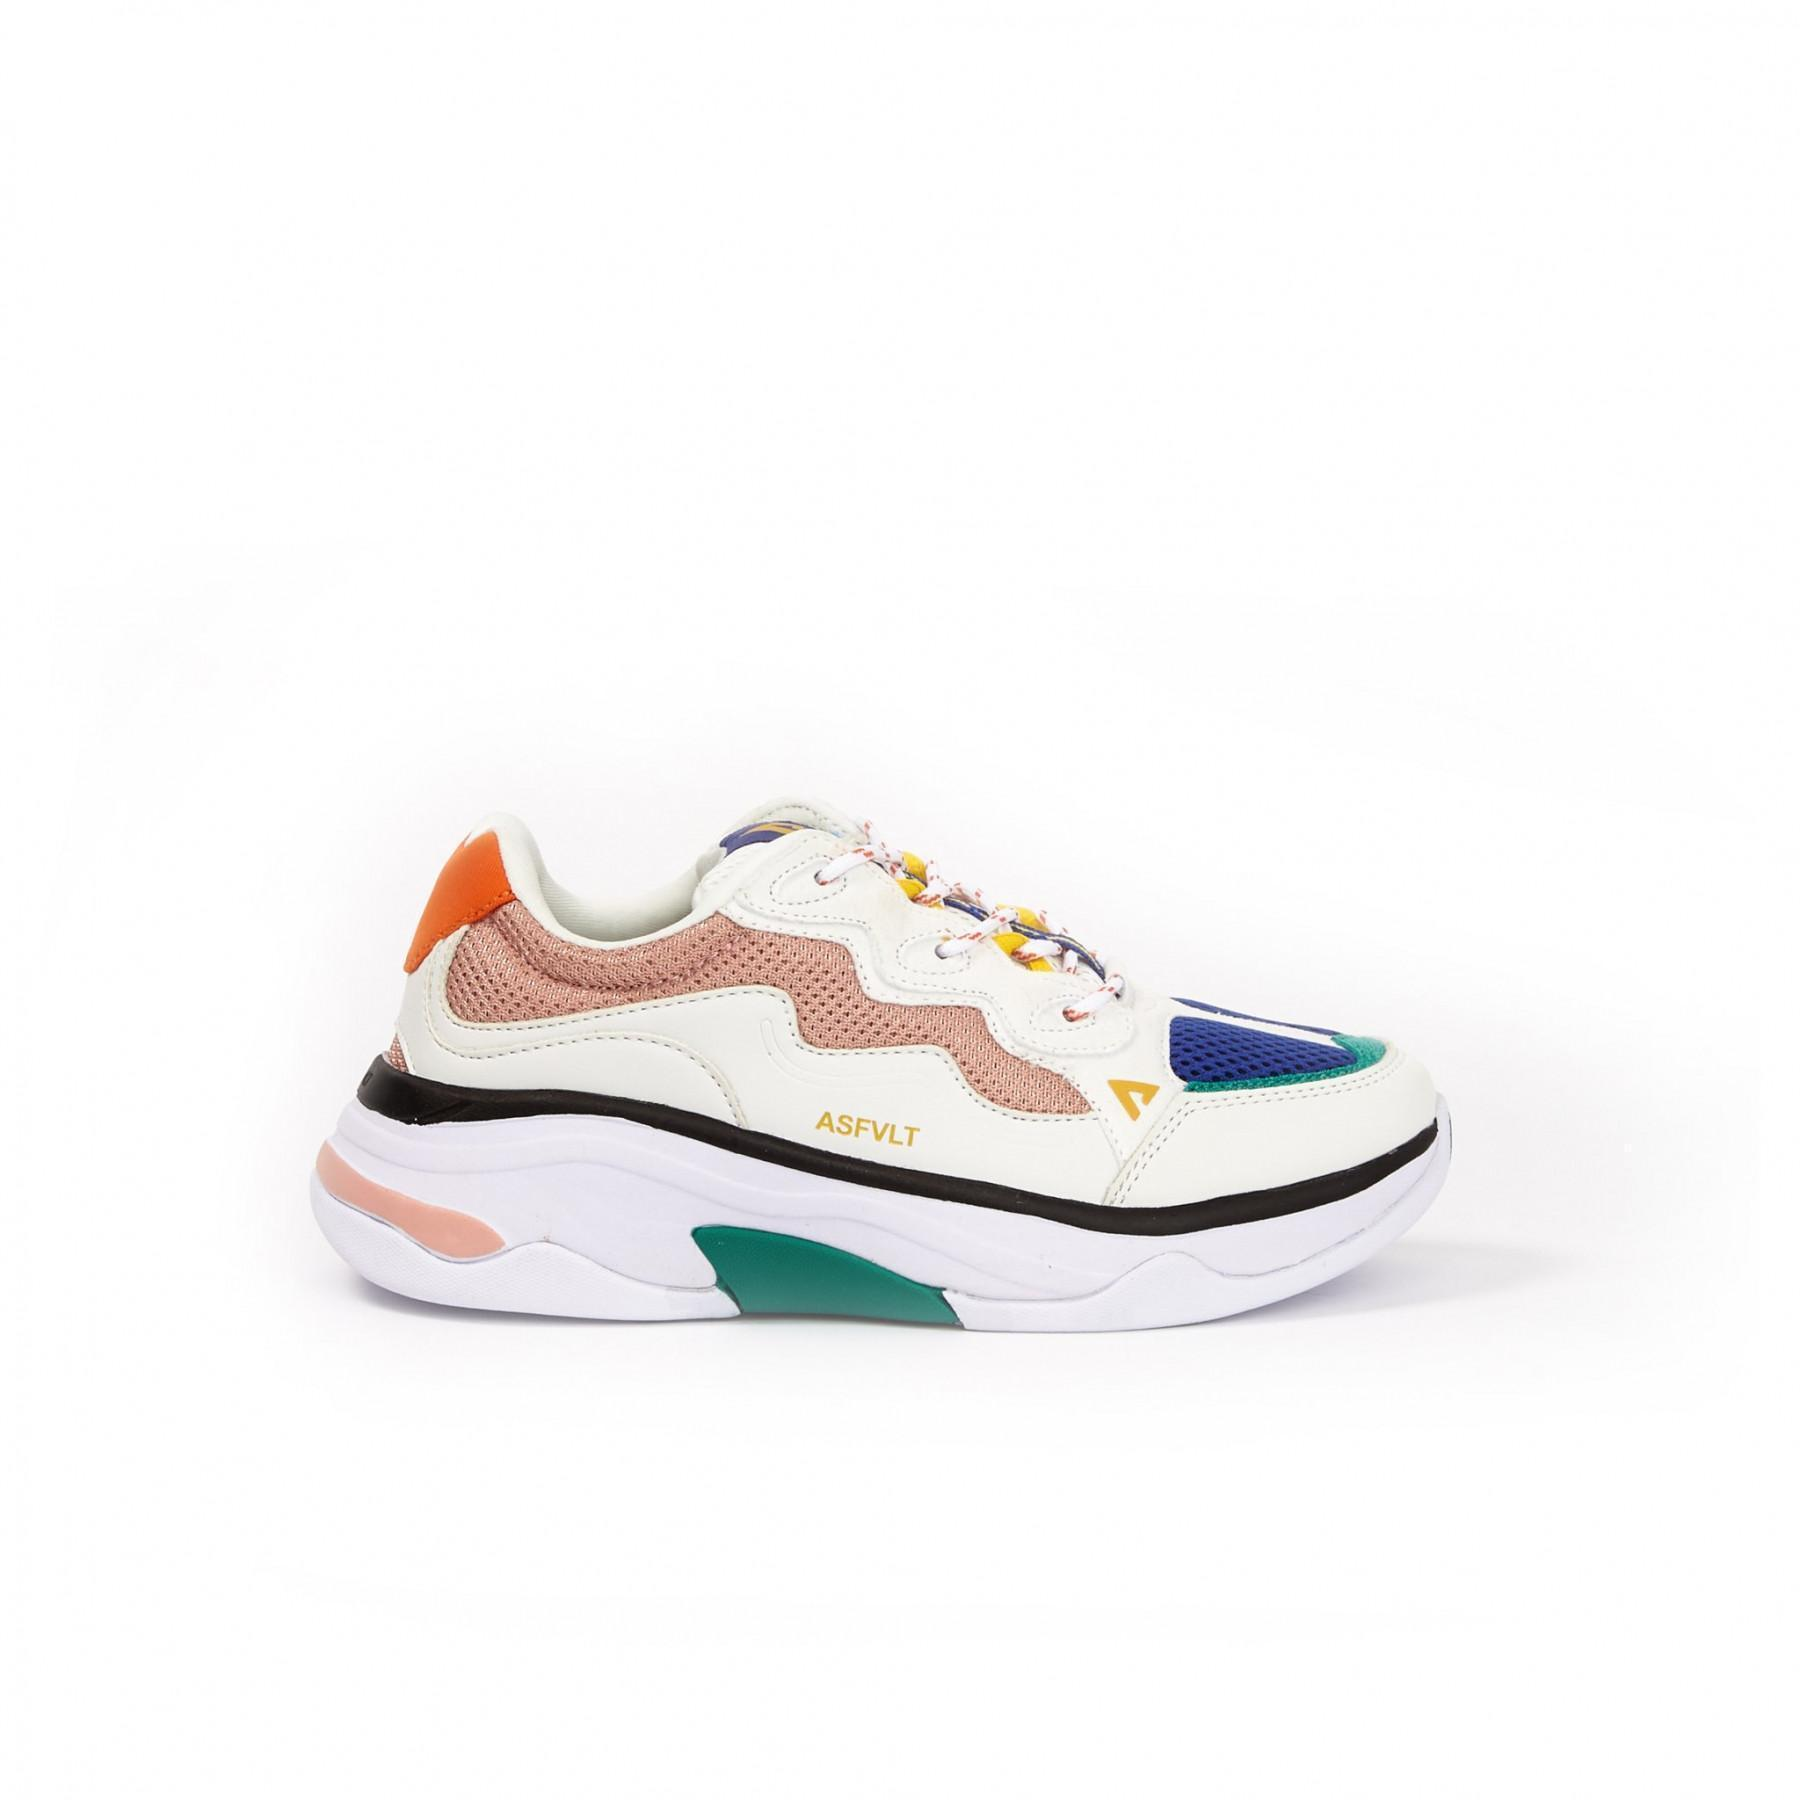 Sneakers Woman ASFVLT Onset